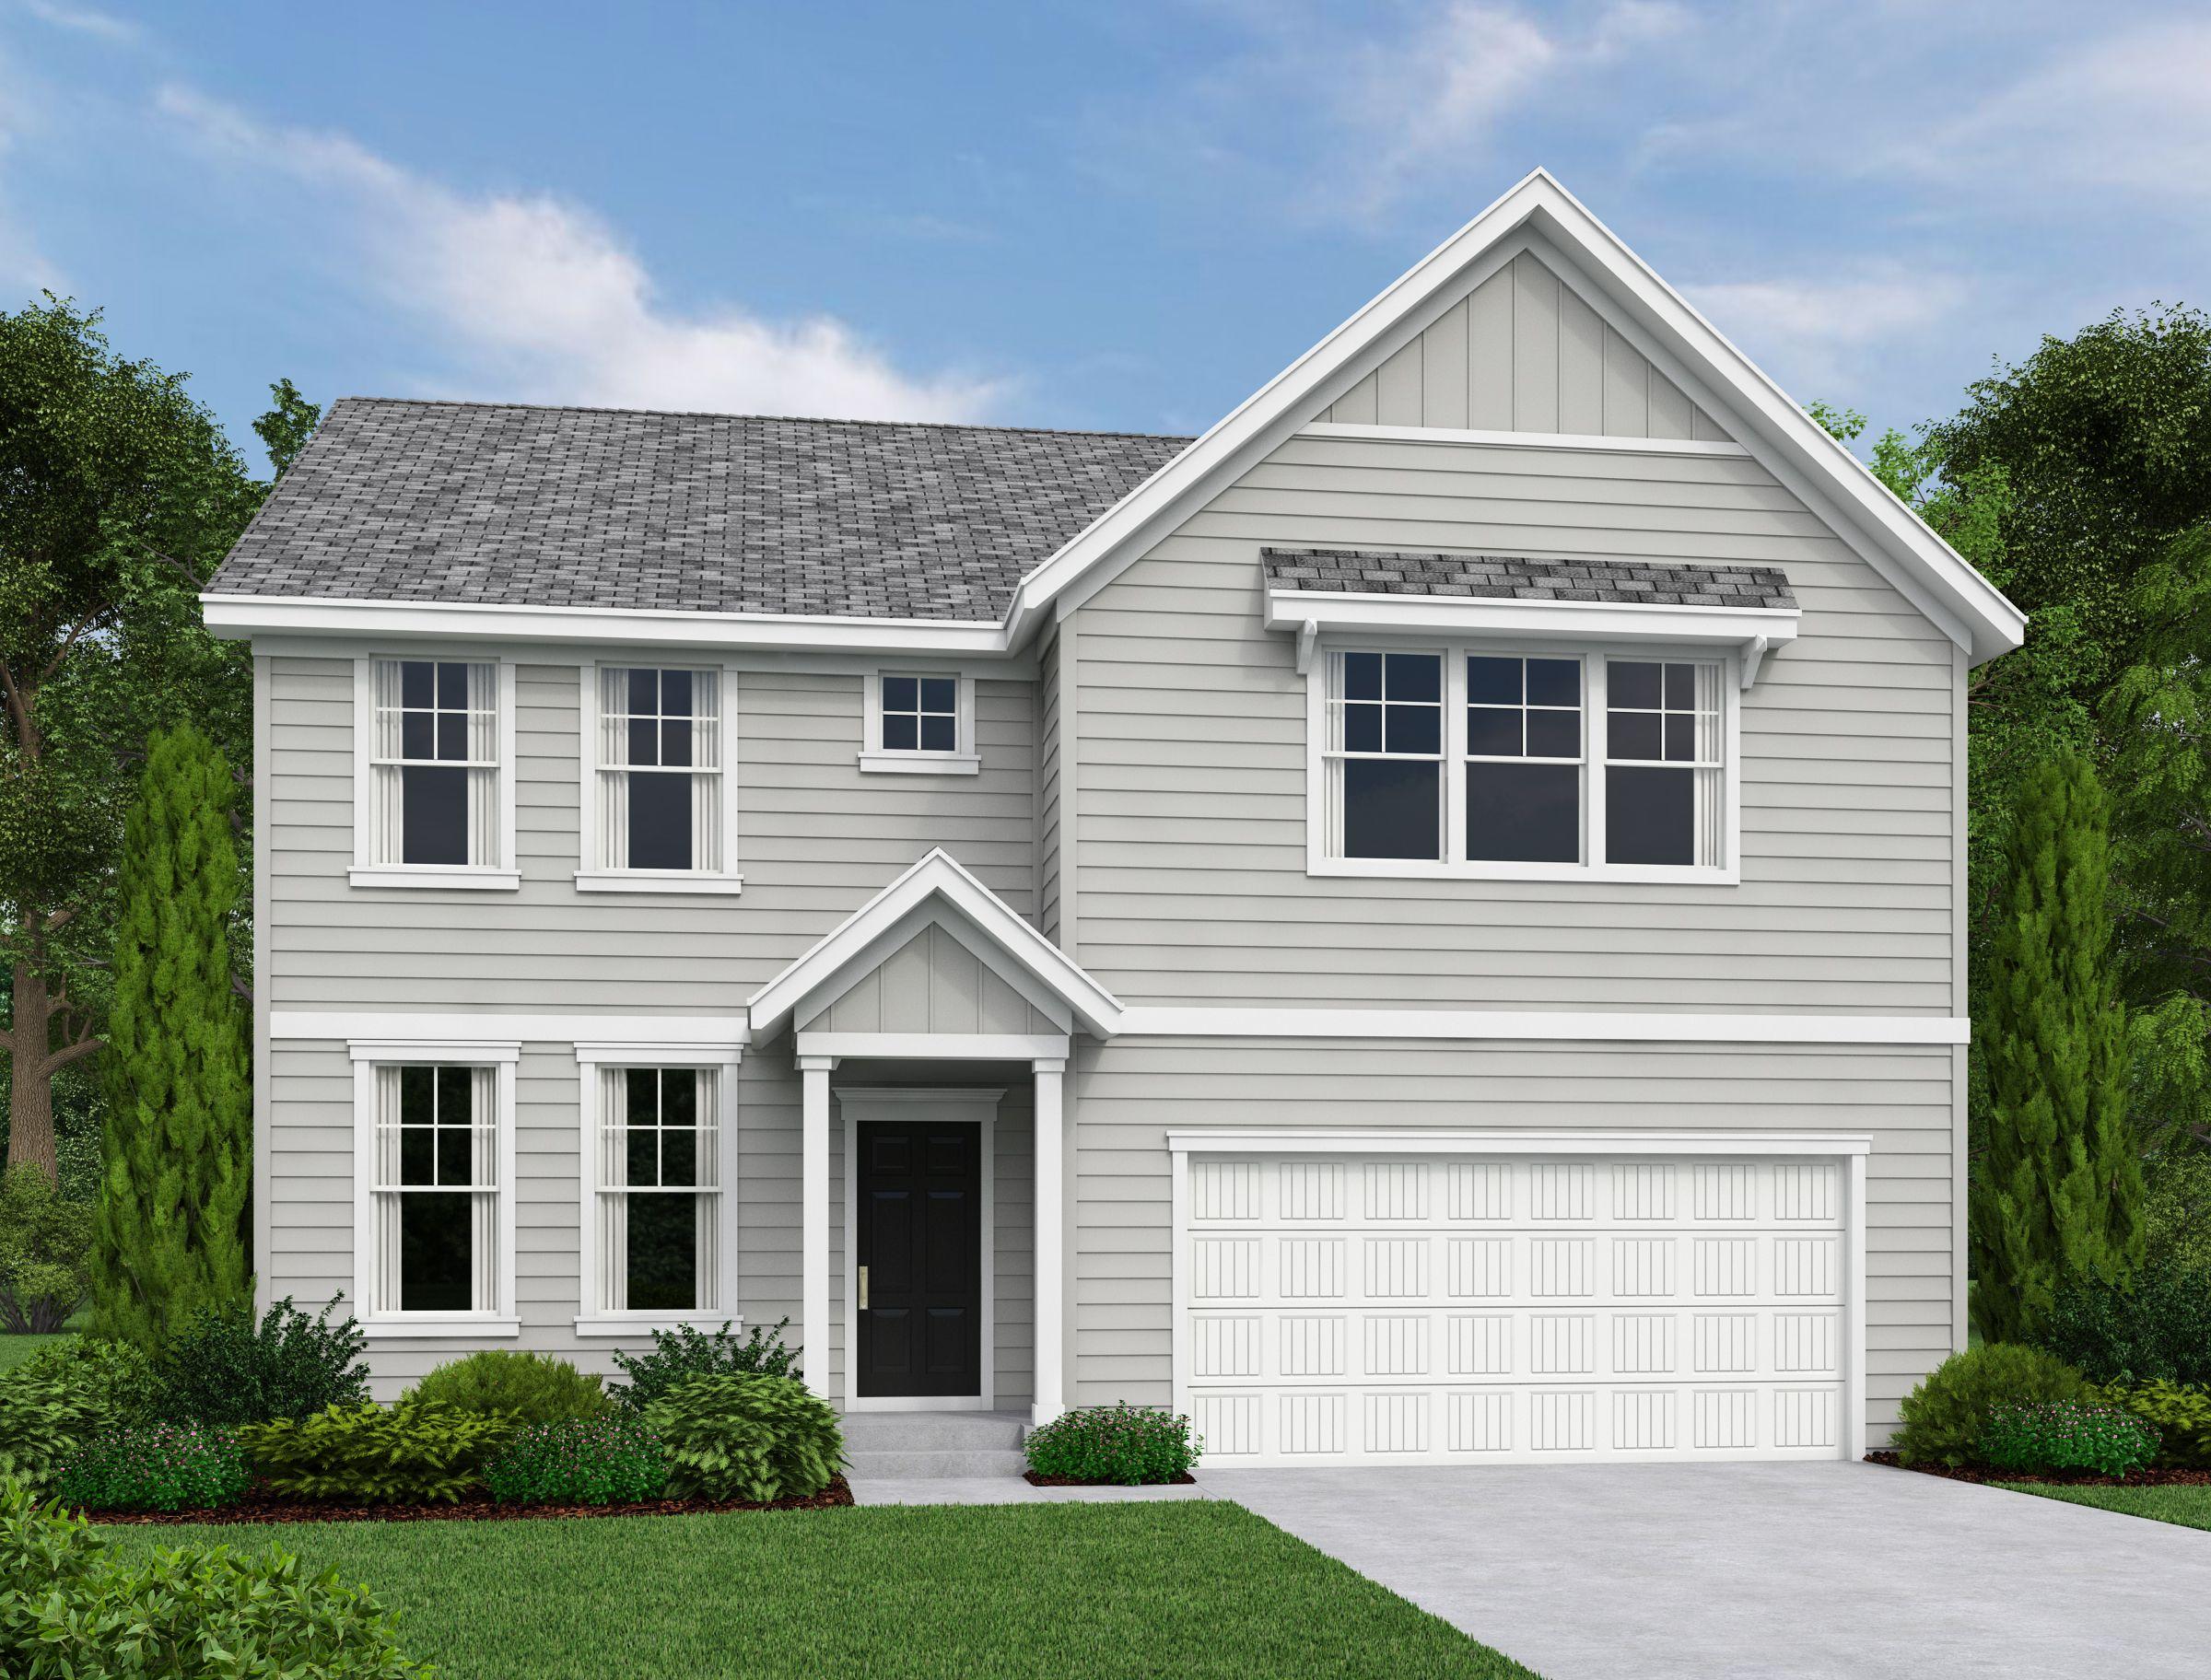 Ashton Woods Homes Johns Island SC Communities & Homes for Sale ...